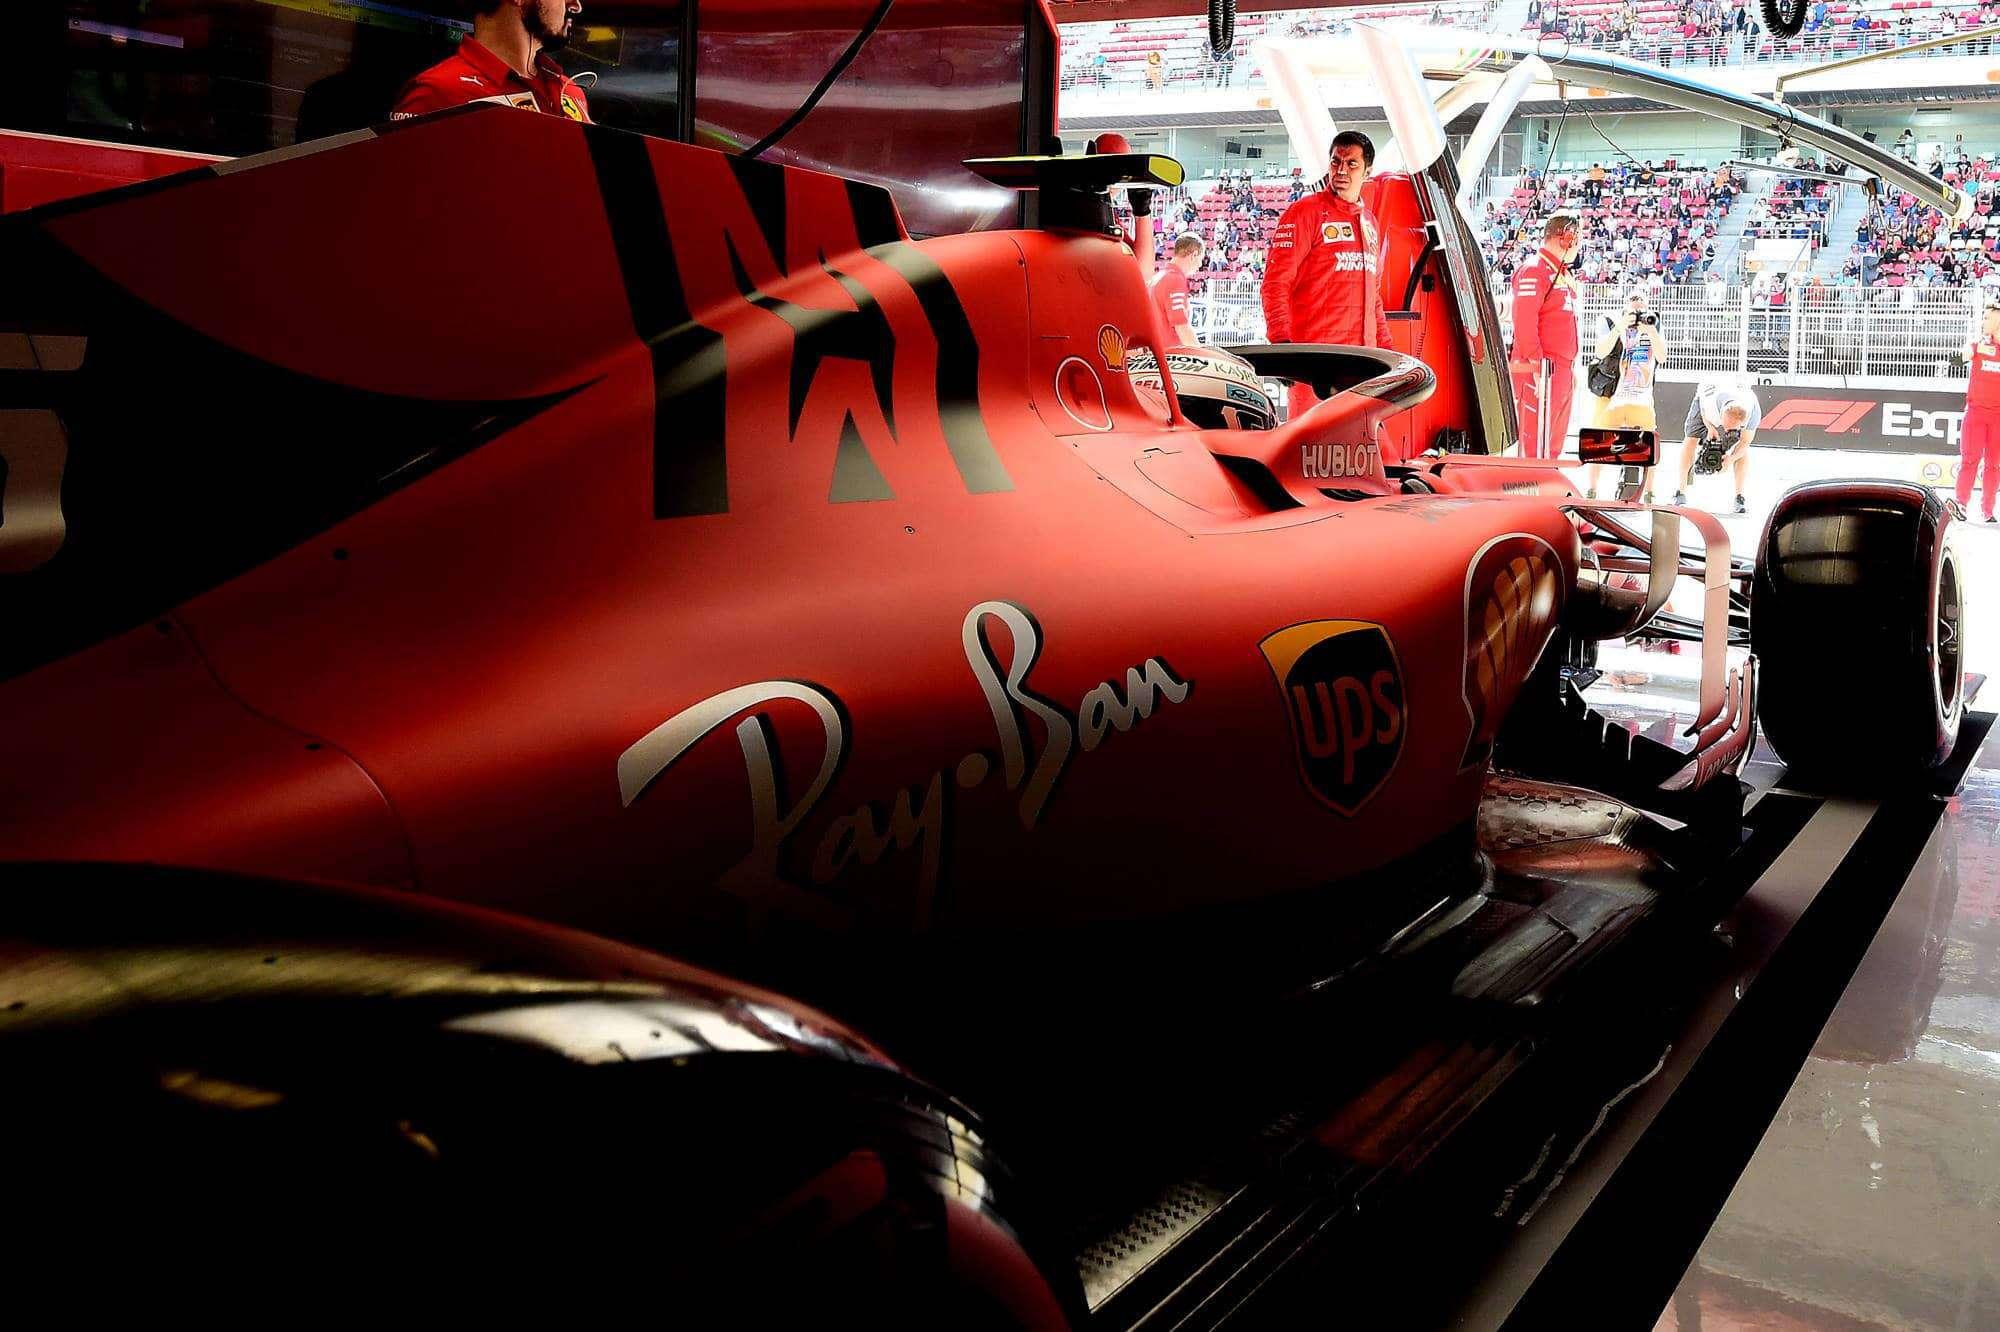 FIA responds to the team's statement about Ferrari PU investigation